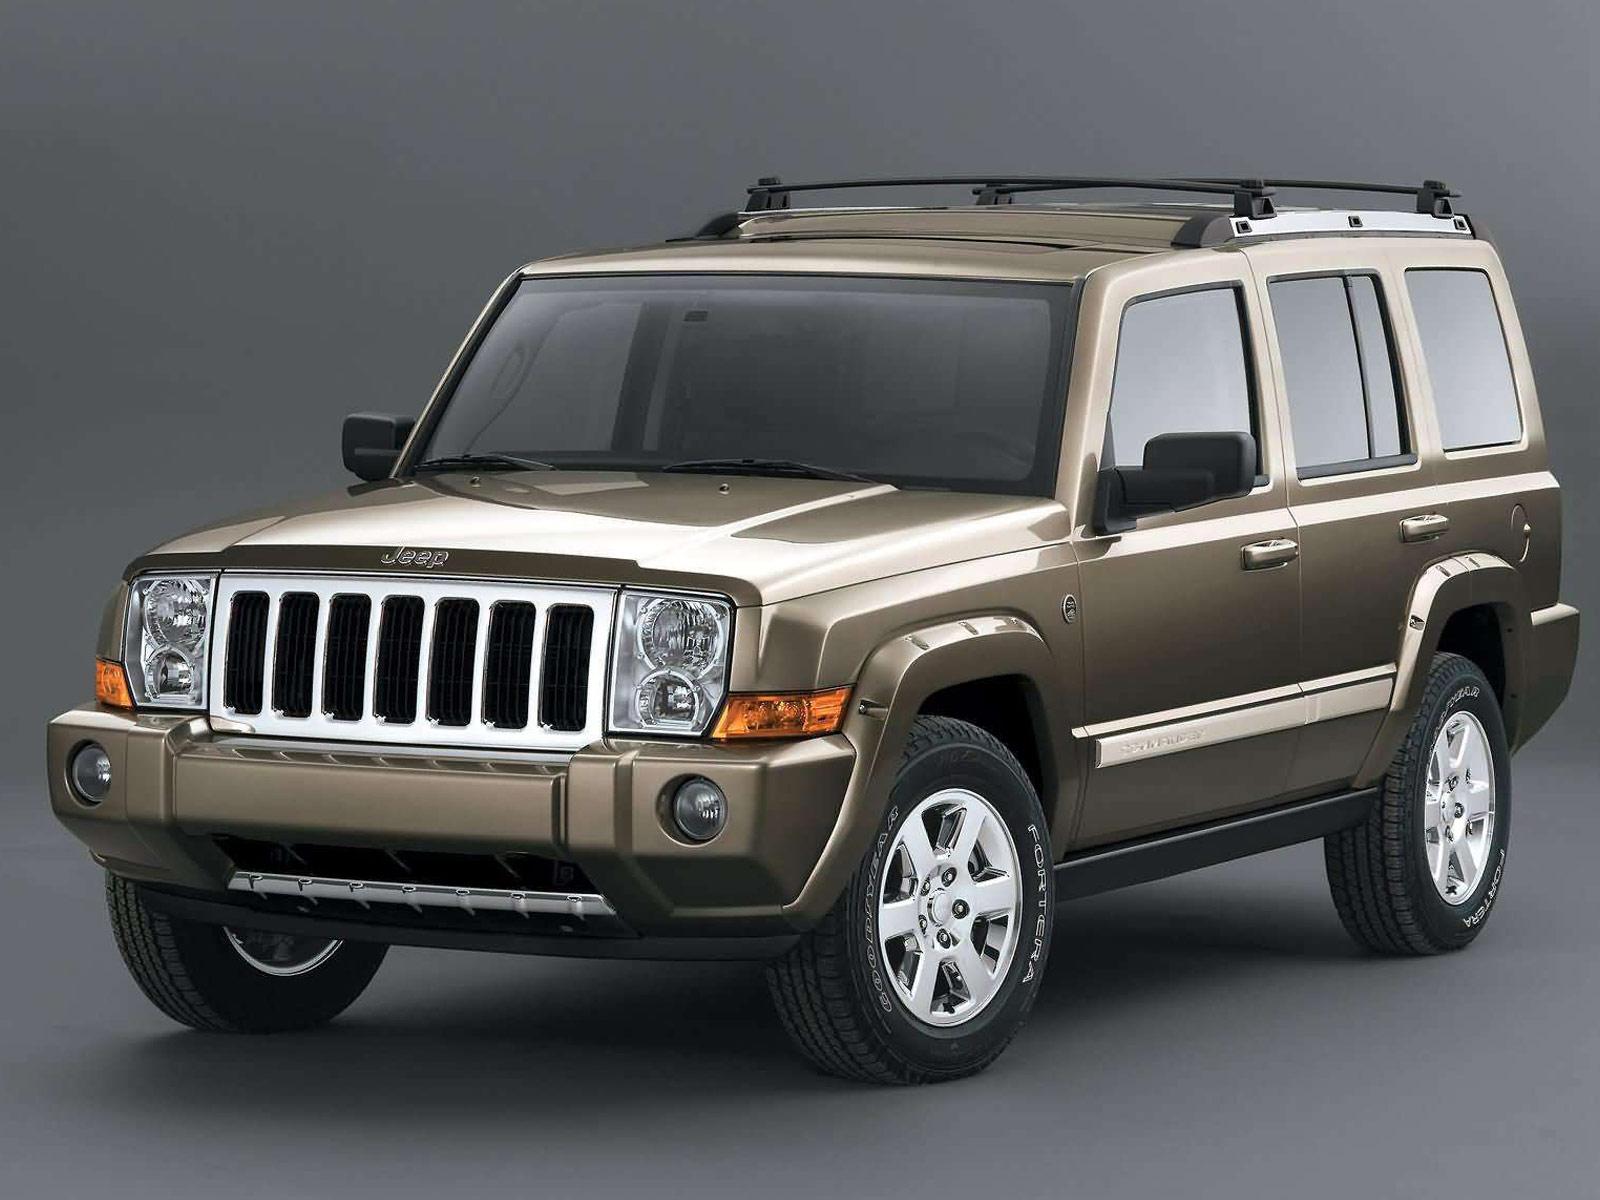 2006 jeep commander 4x4 limited 5 7 hemi pictures. Black Bedroom Furniture Sets. Home Design Ideas